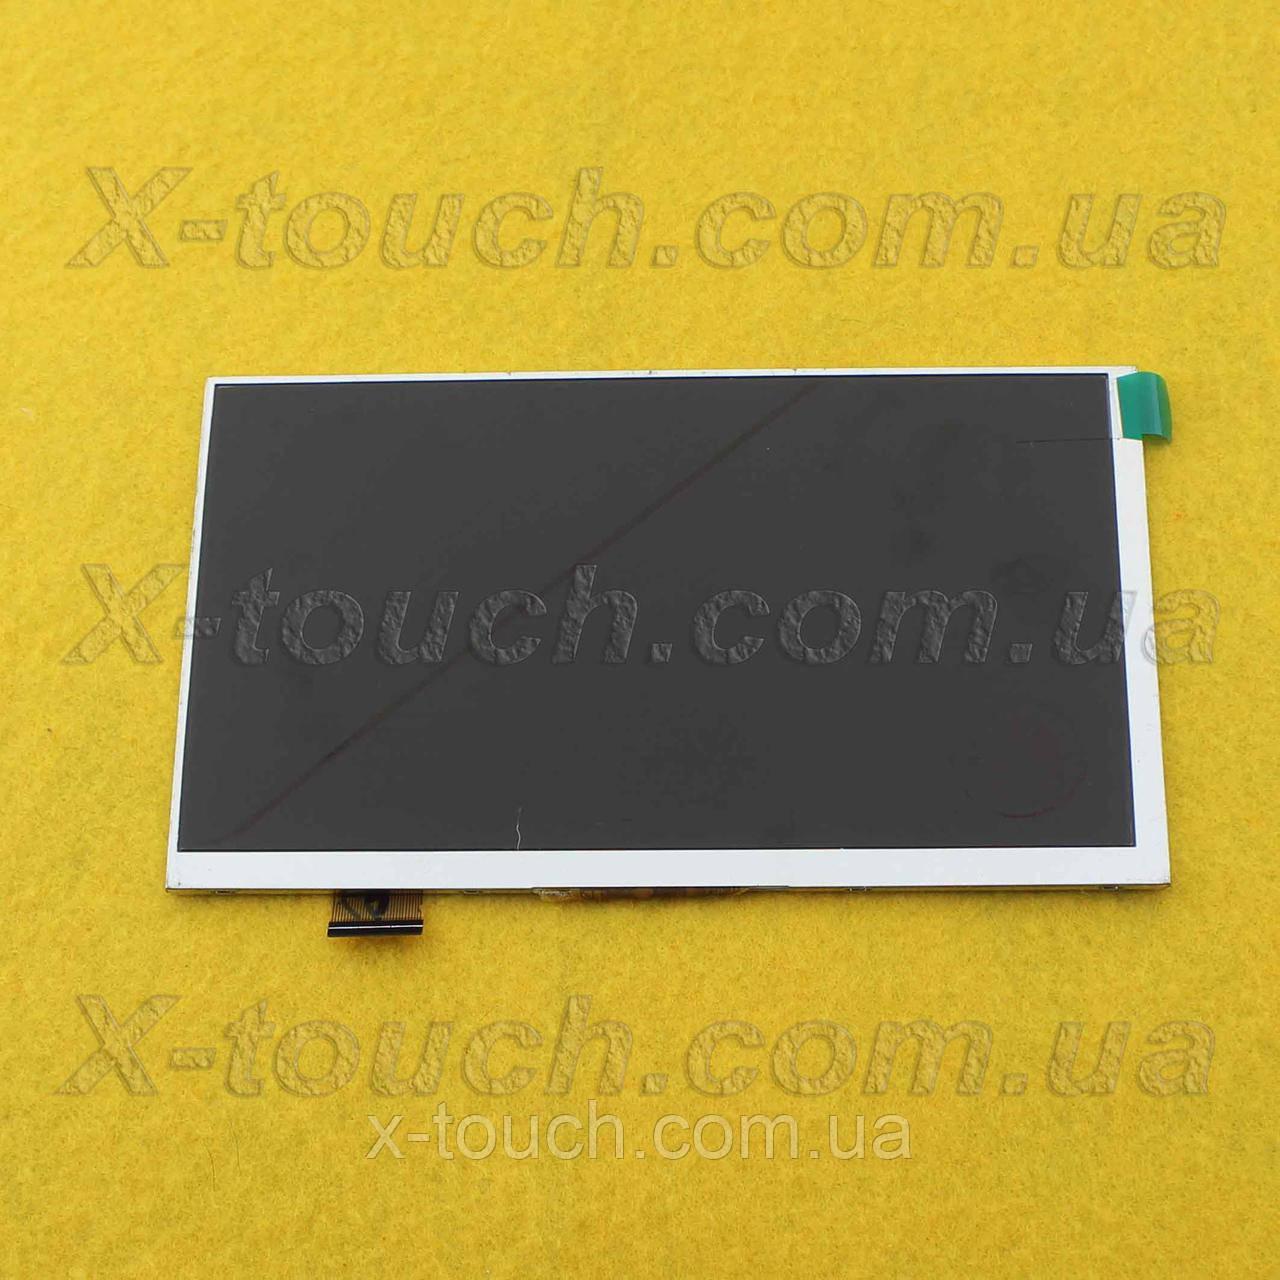 Матриця,екран, дисплей 31400600038 для планшета